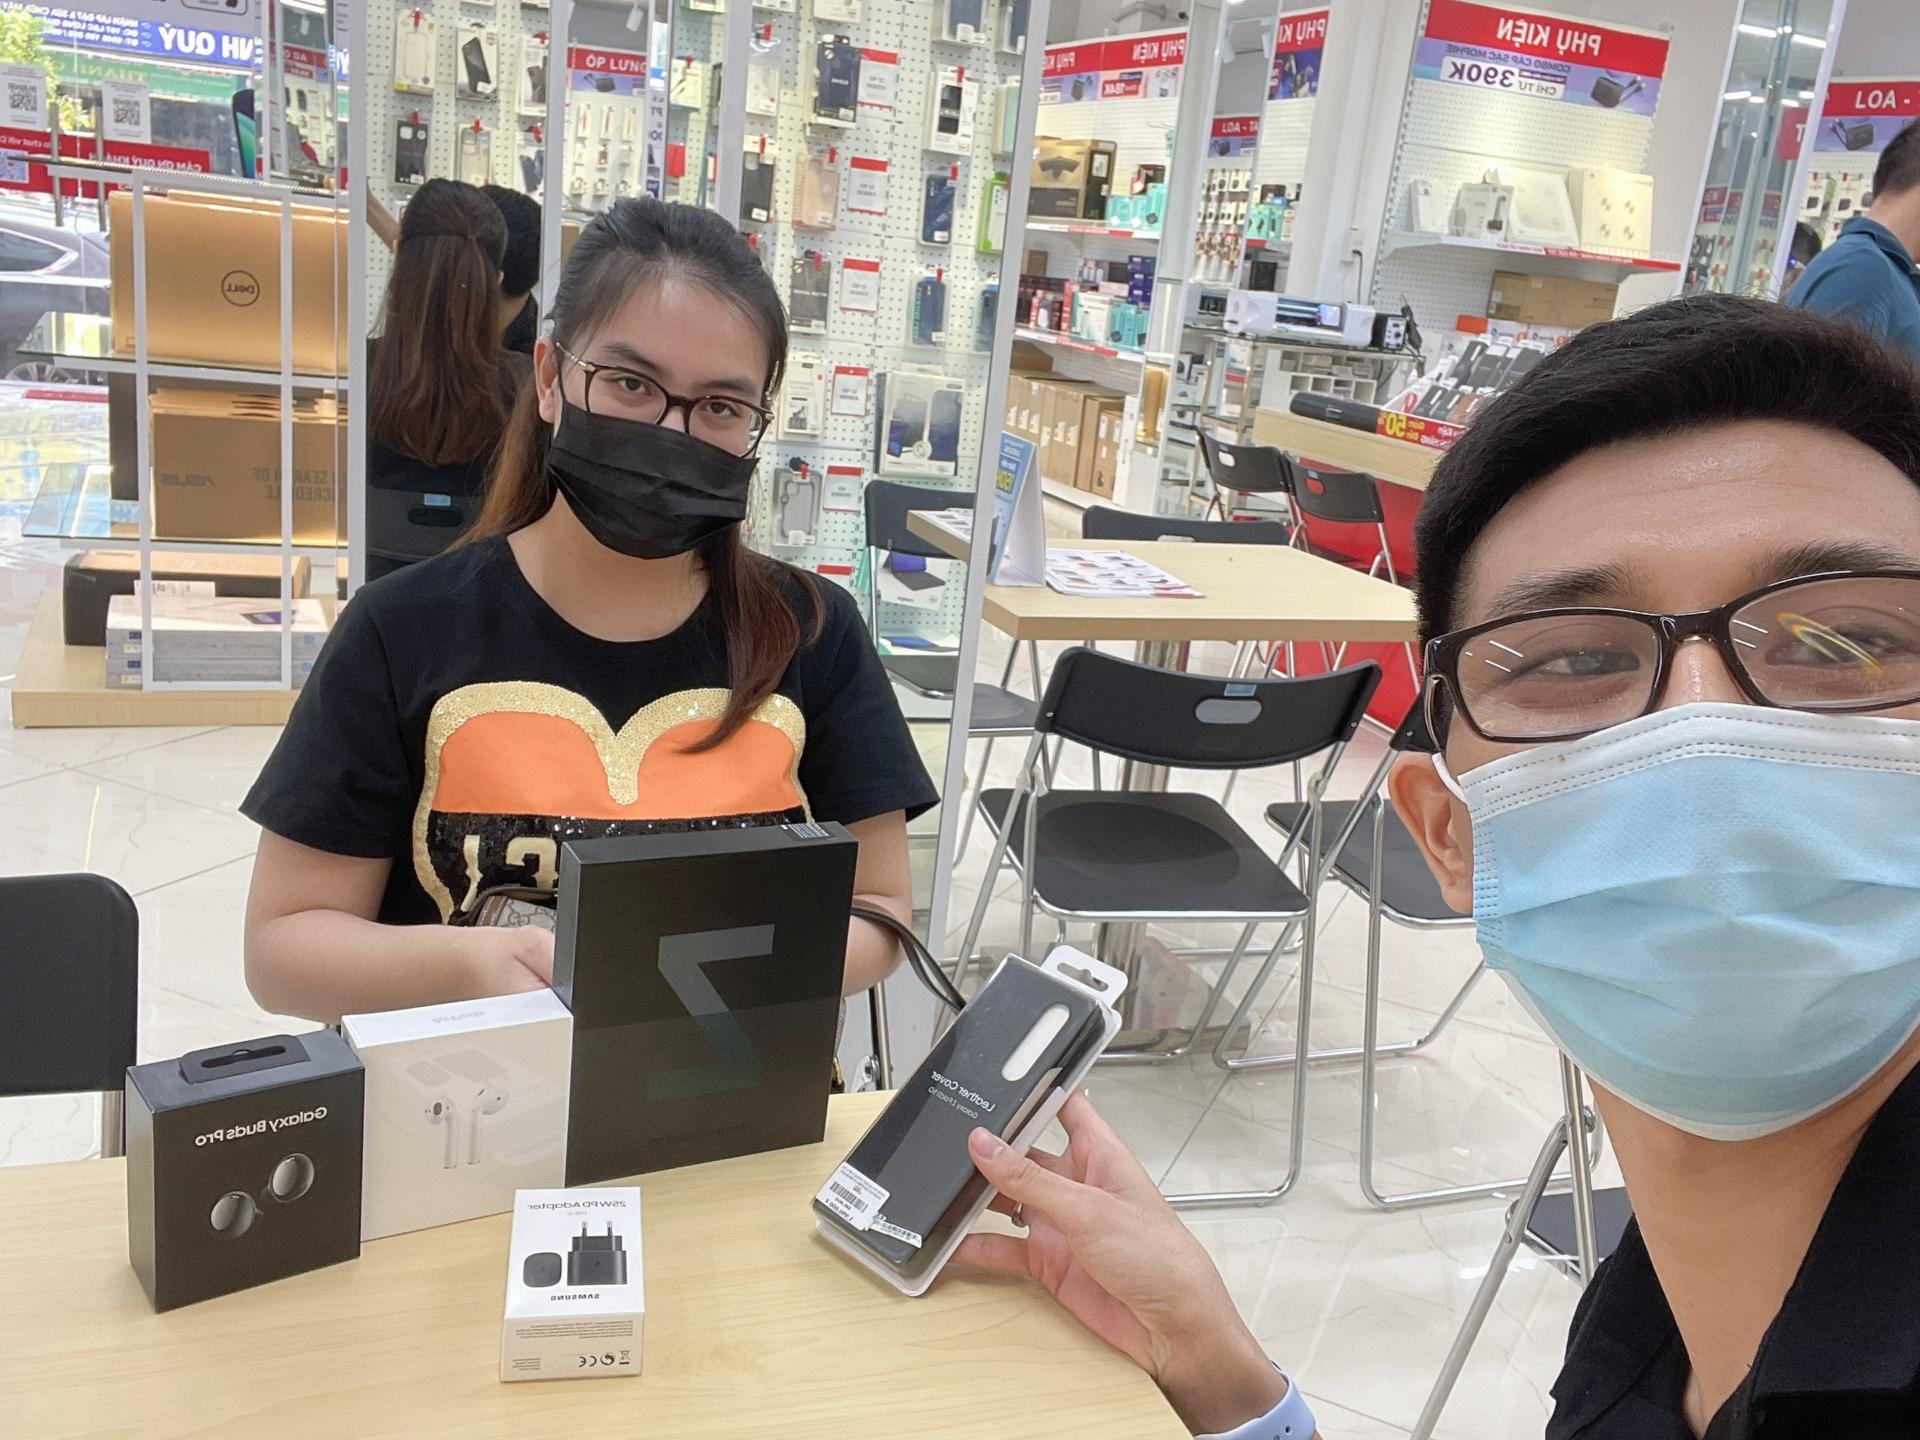 CellphoneS mở bán gần 1500 đơn cọc Galaxy Z Fold3, Z Flip3